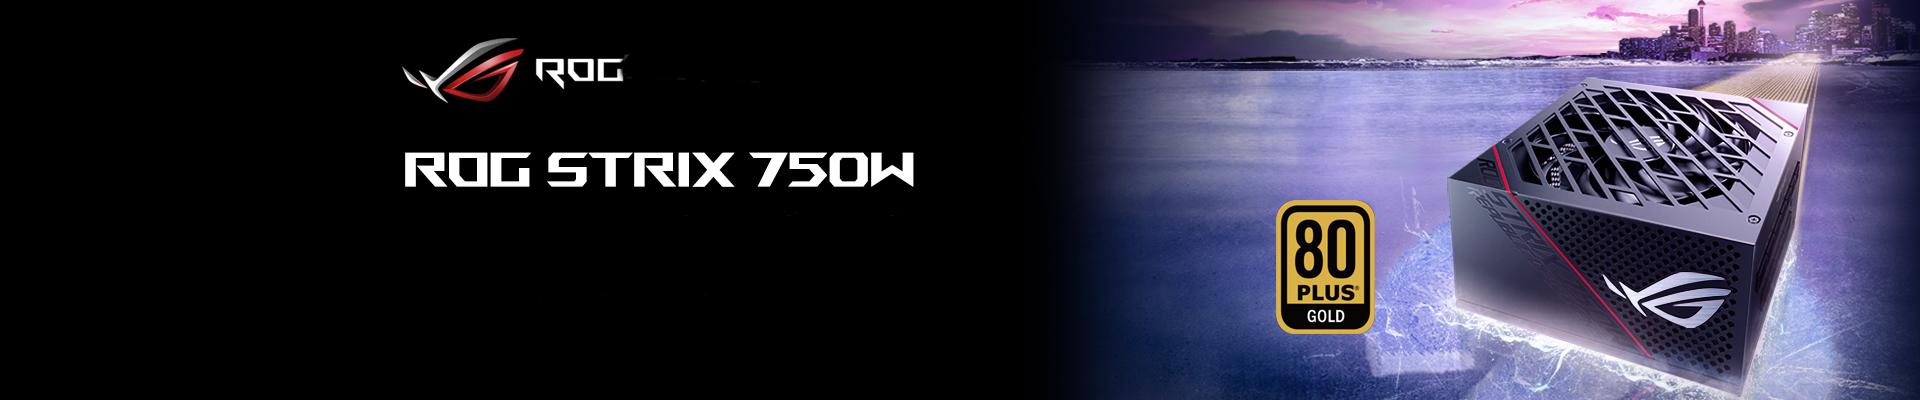 Rog Strix 750w